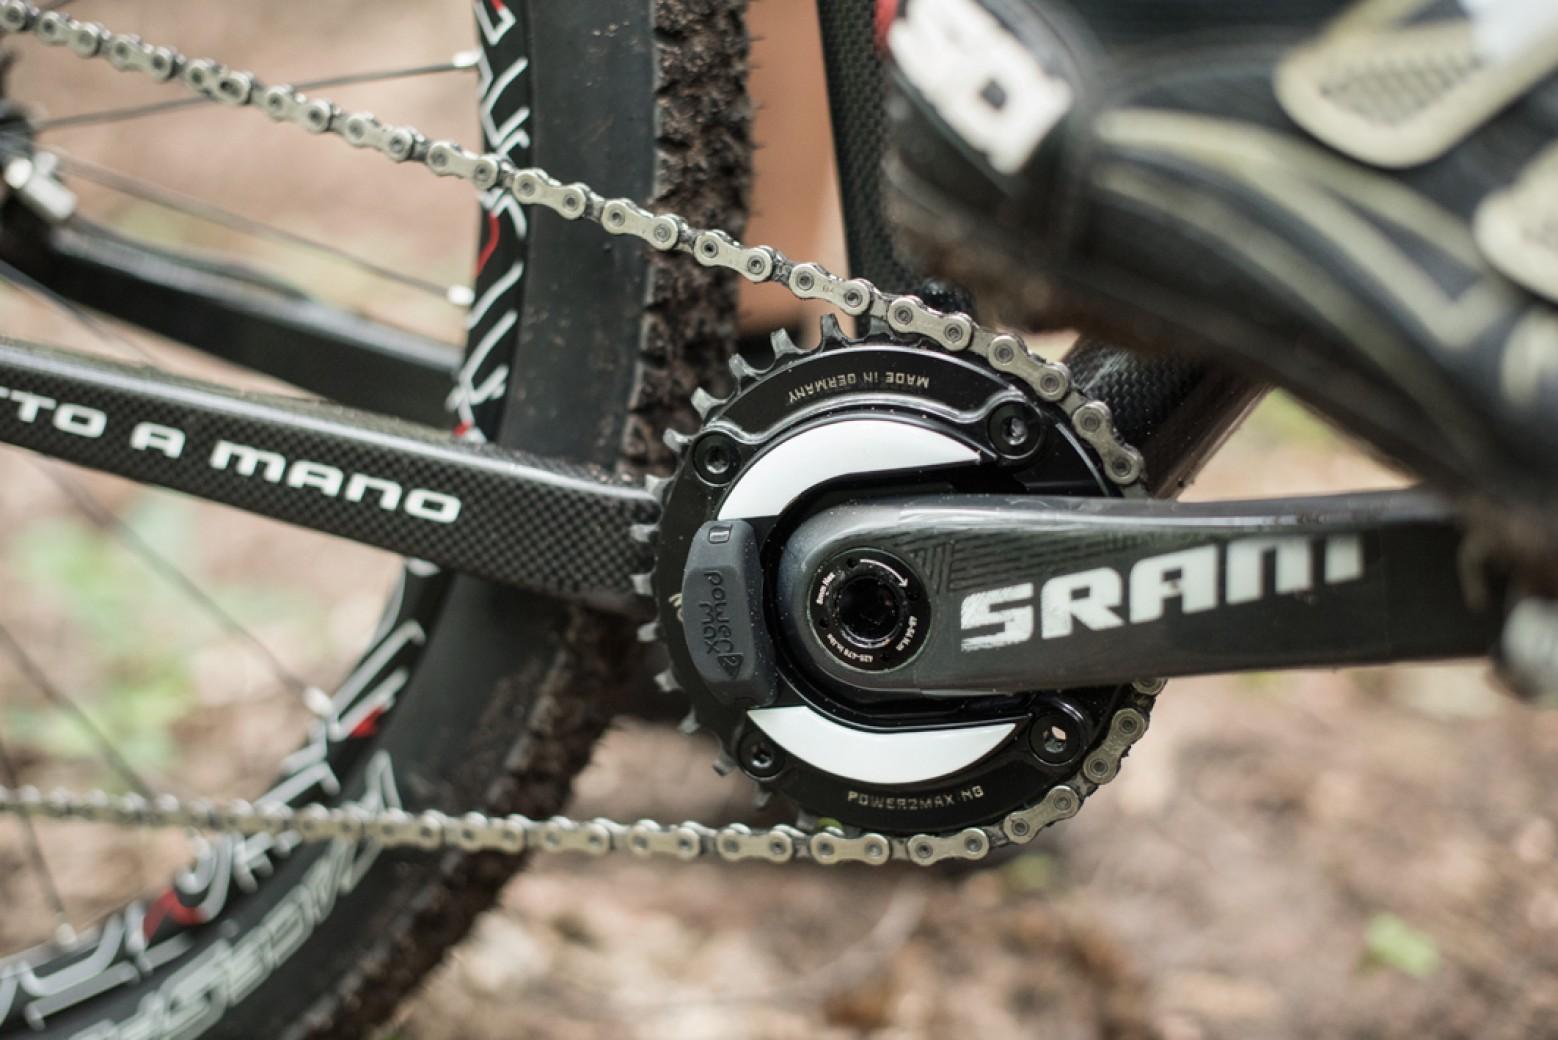 mejores-potenciometros-para-mountain-bike/